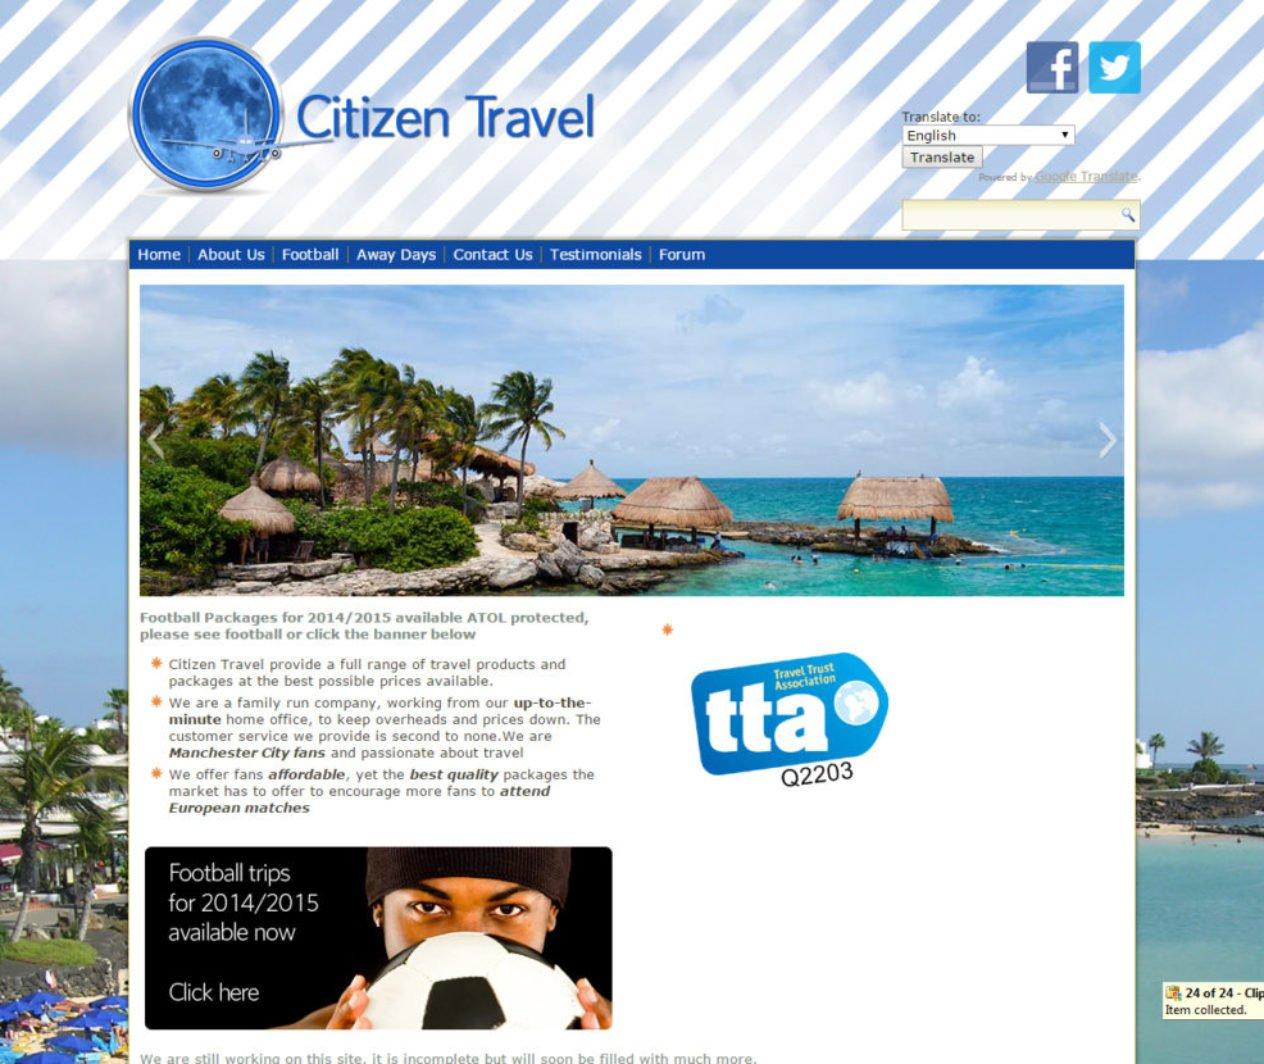 Citizen Travel